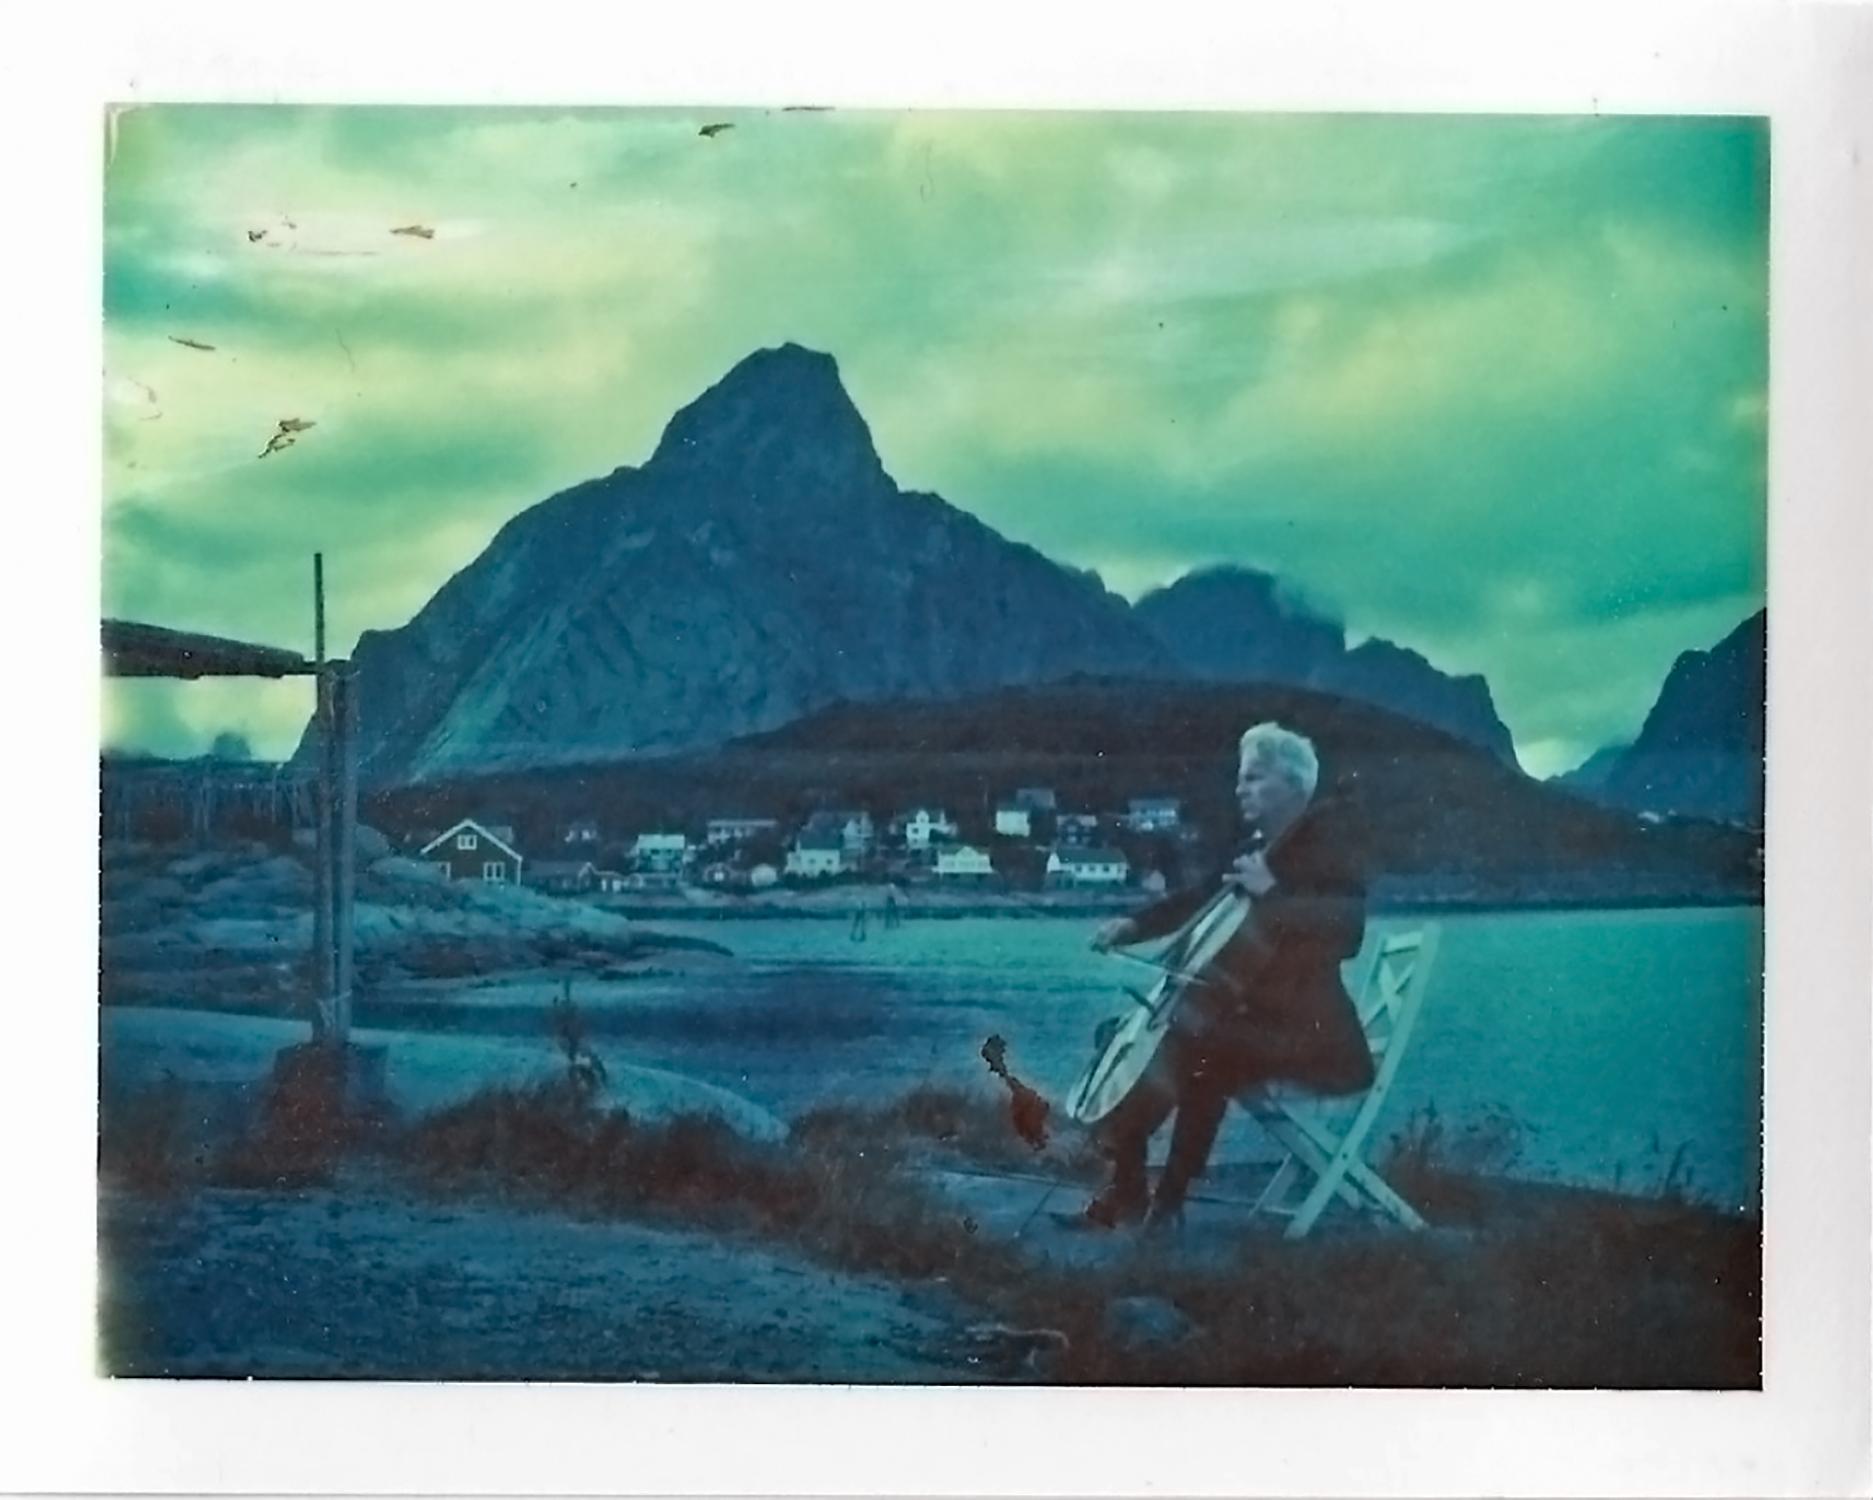 """Øyvind Gimse"" by Alex Conu"